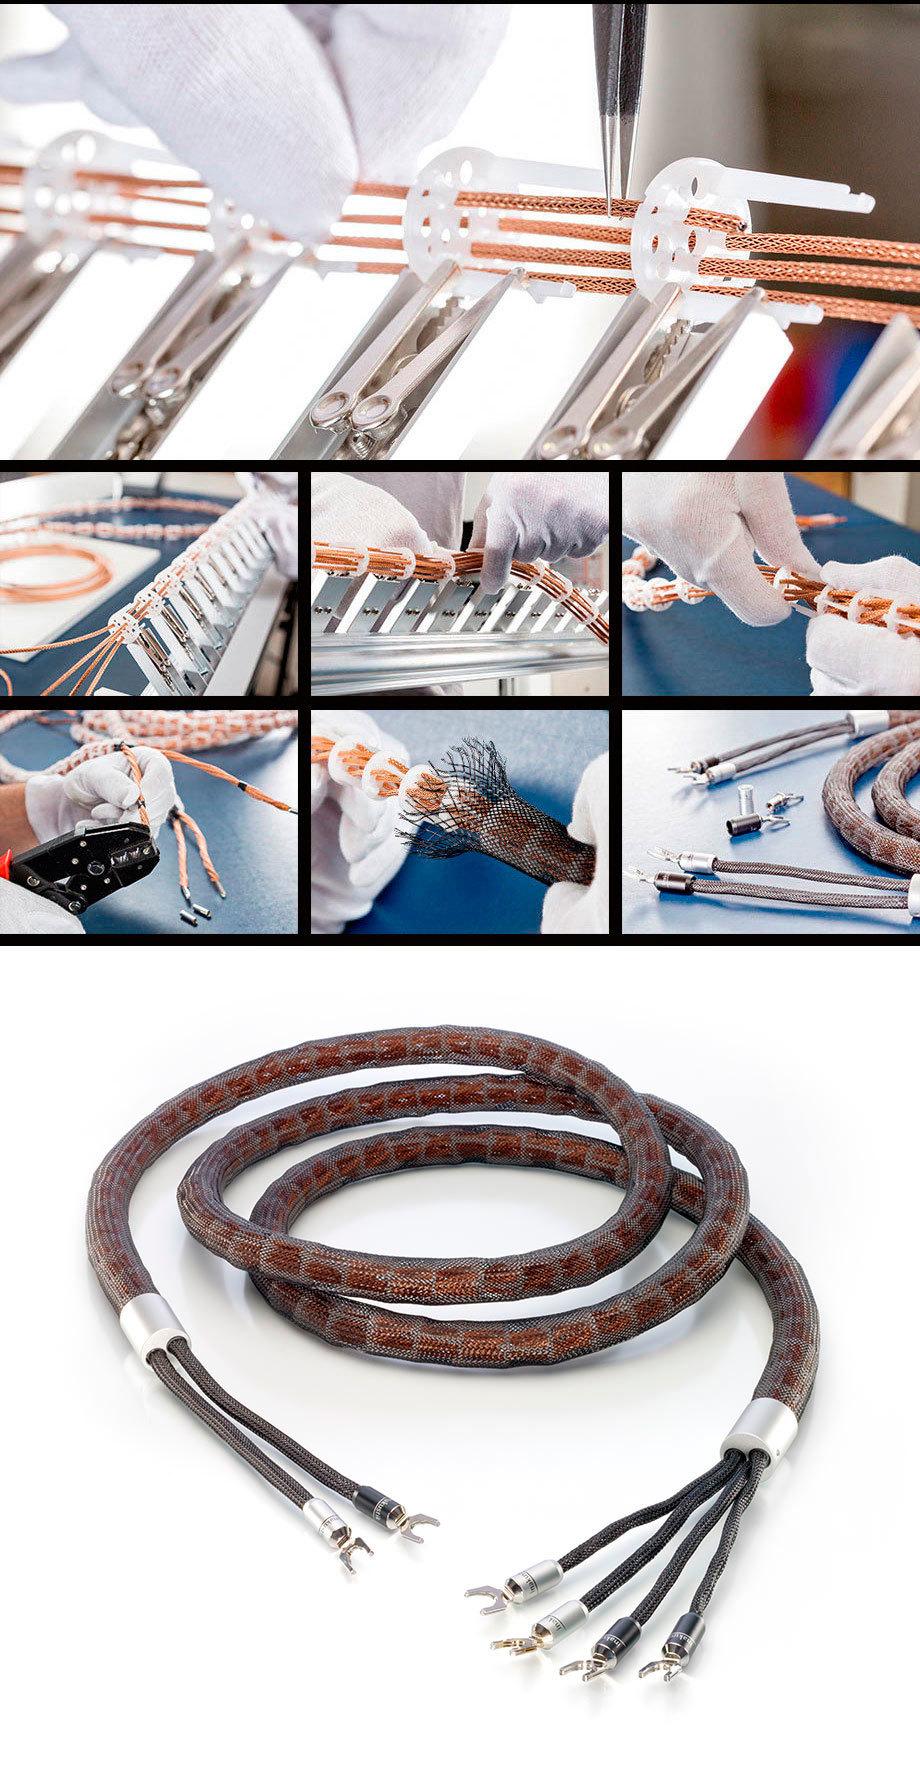 Inakustik Referenz LS-2404 AIR MKII, 2x3.0 m, Tellurium BFA Banana, Single-Wire 007712436